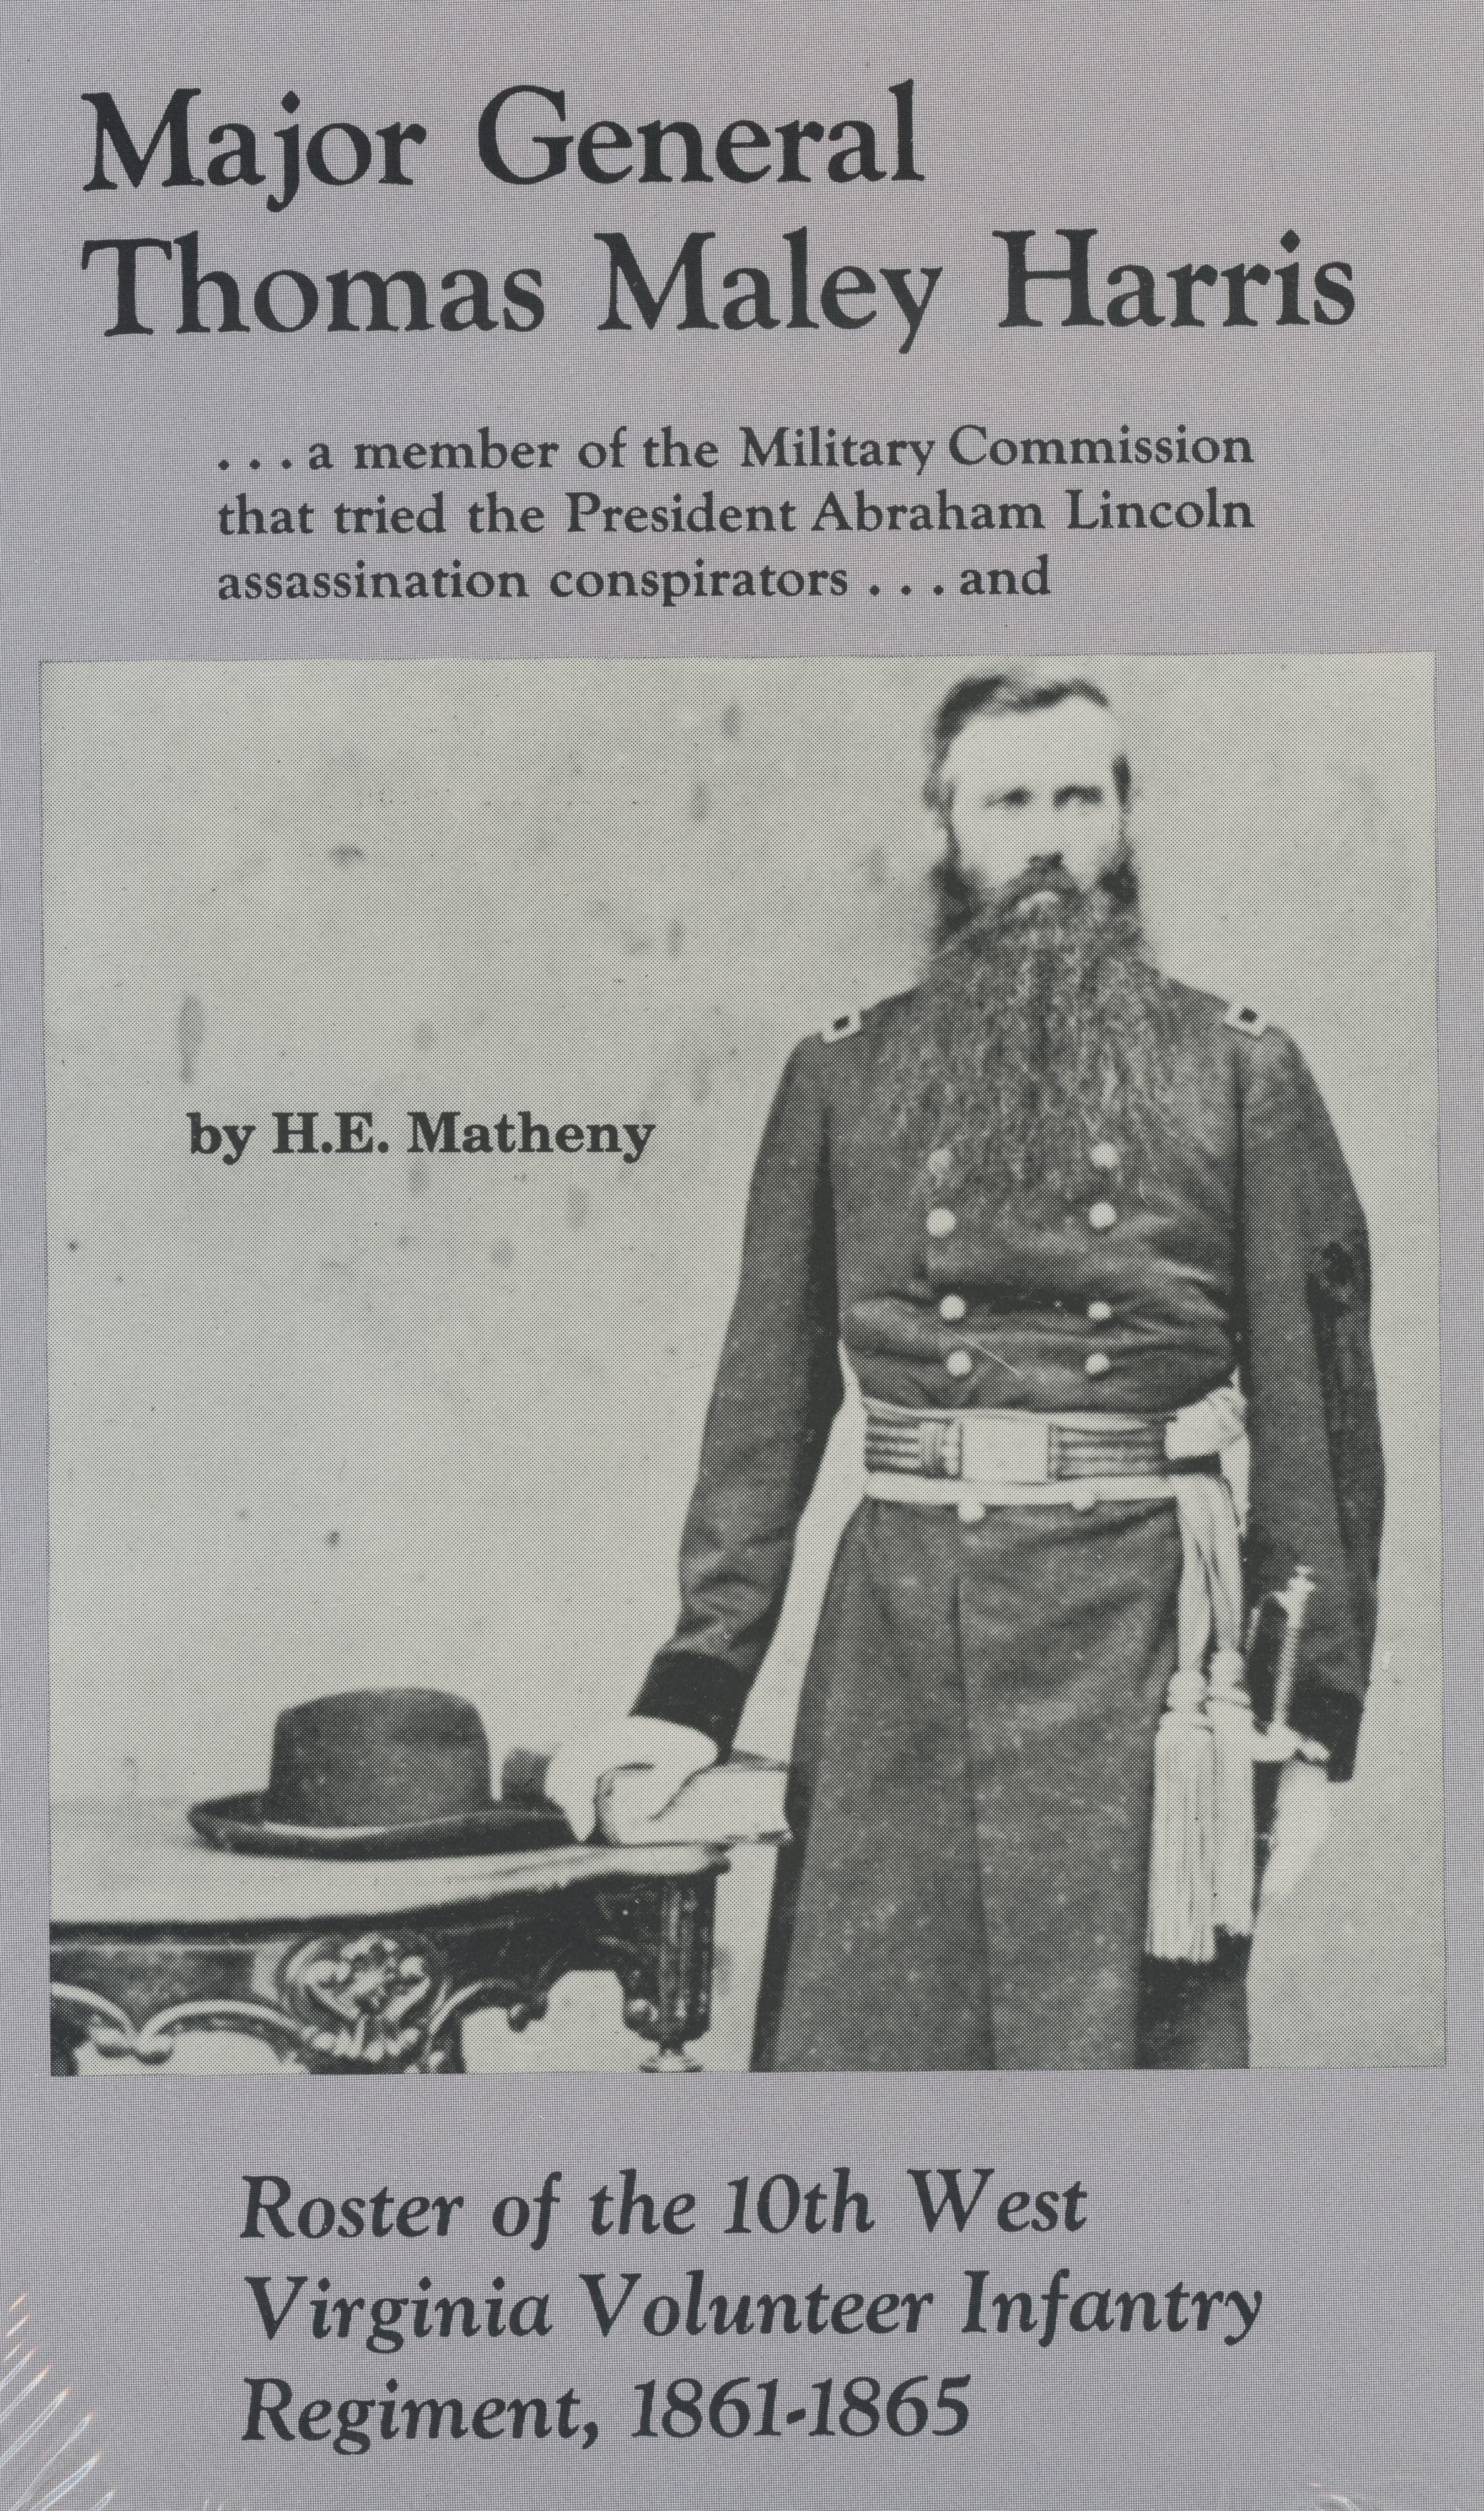 Major General Thomas Maley Harris